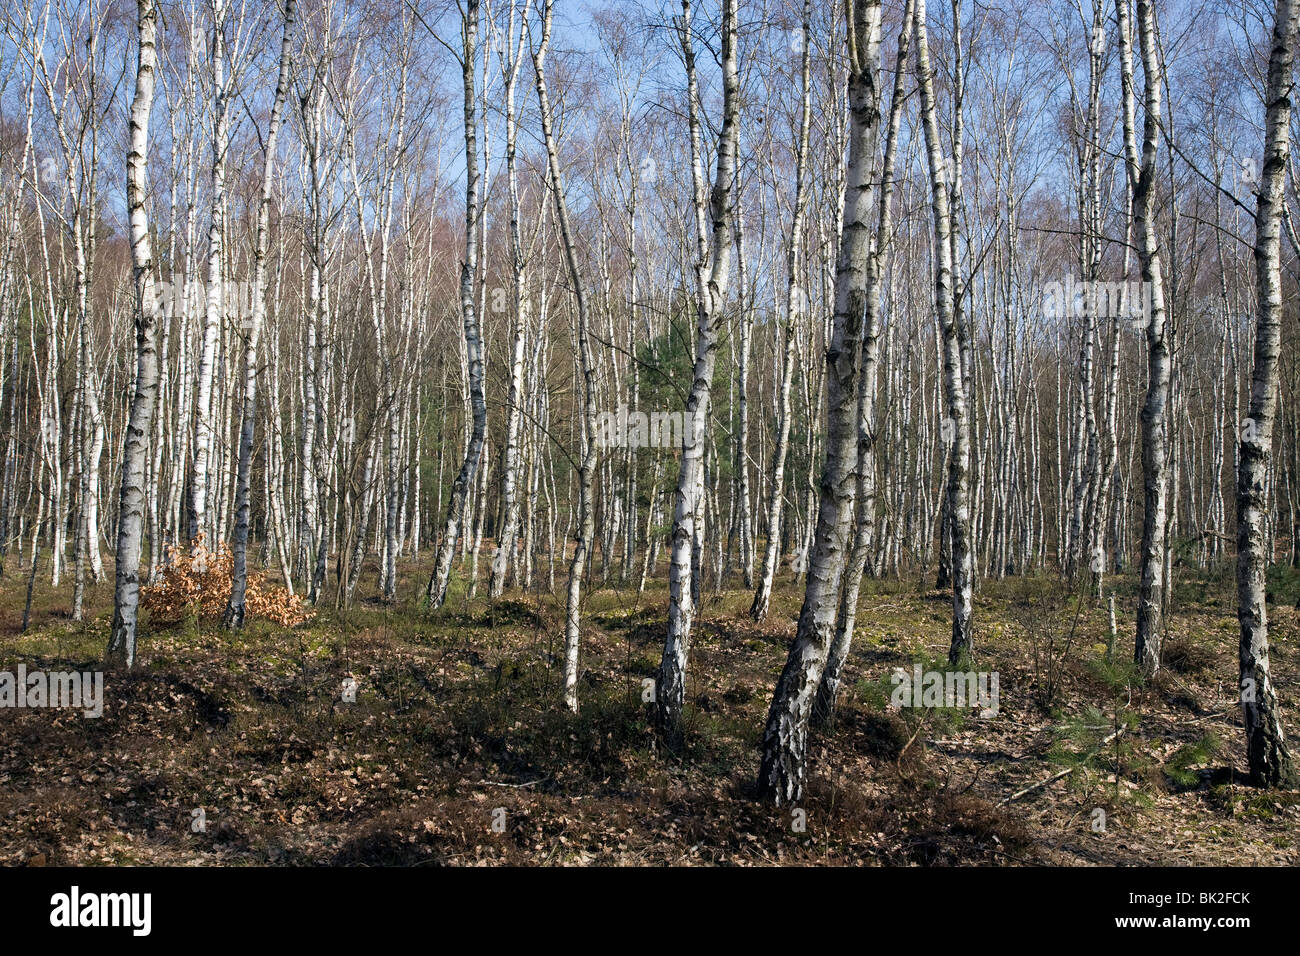 Silver Birch Trees near Rehmate, Barnim, Brandenburg, Germany - Stock Image